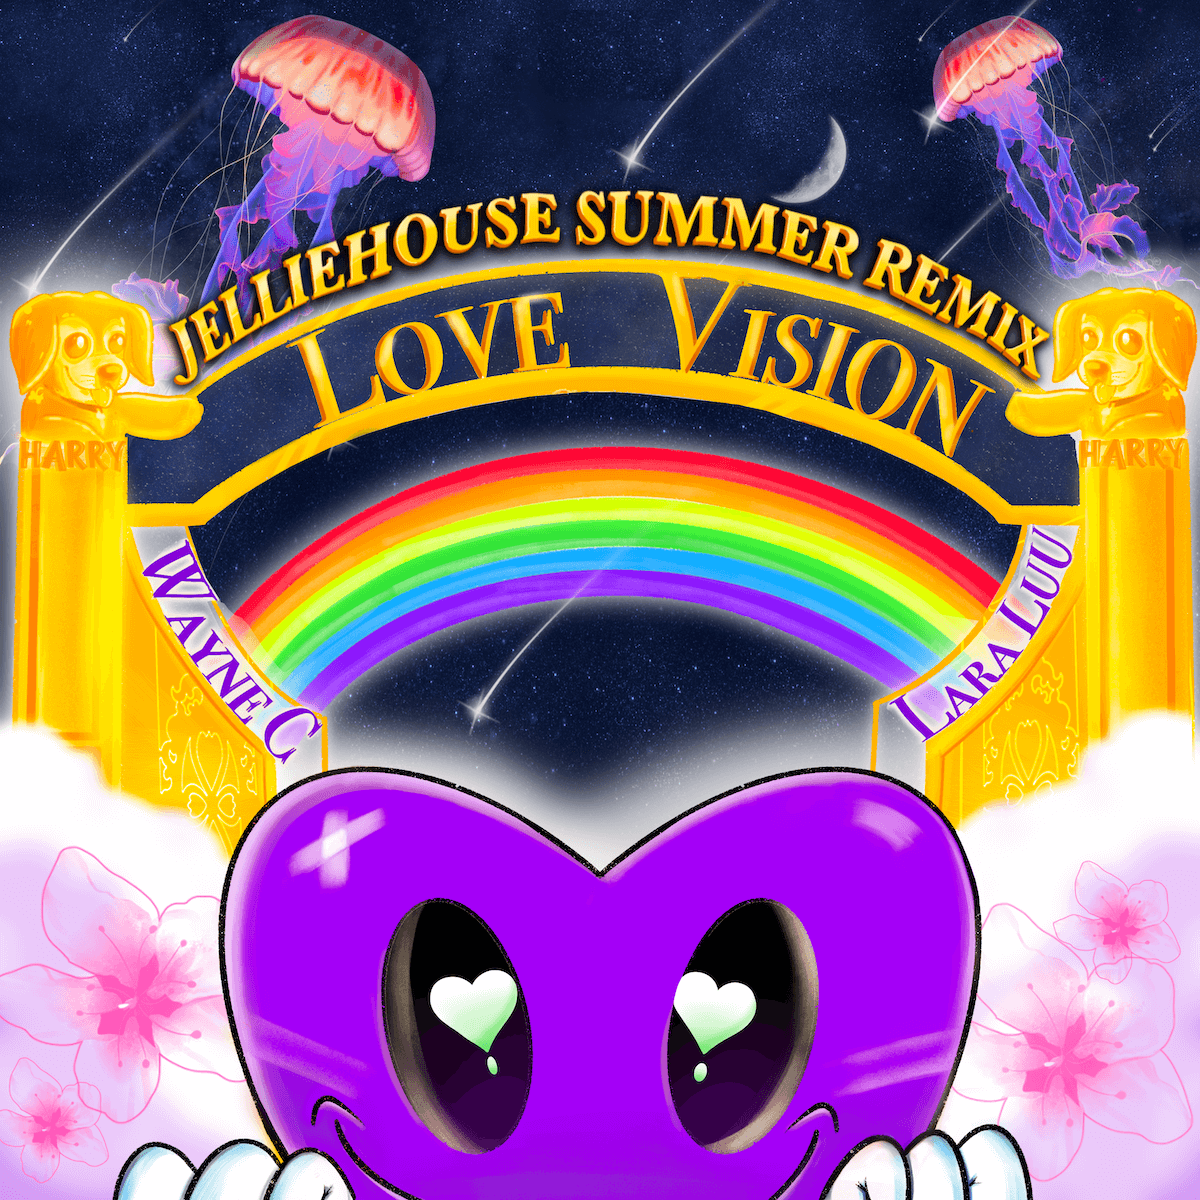 Love-Vision-Jelliehouse-Summer-Remix